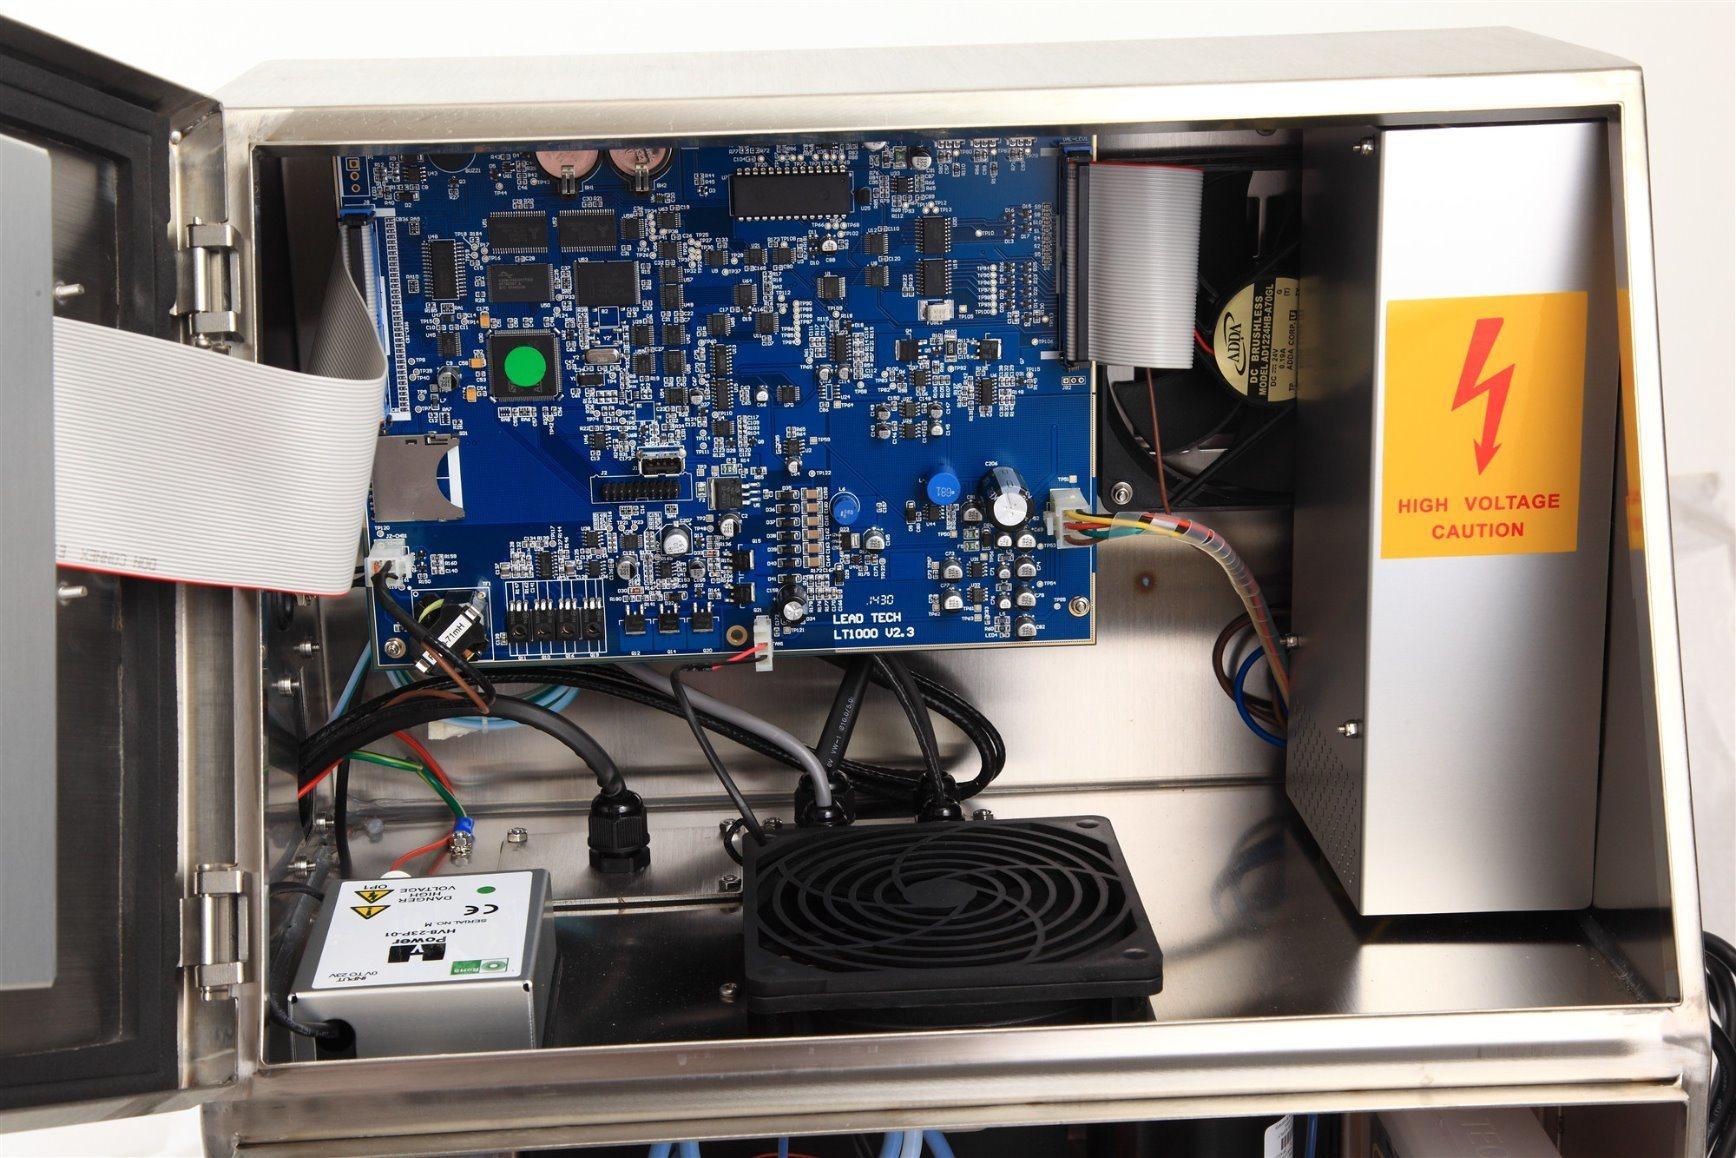 Lead Tech Lt1000s+ Pet Bottle Coding Cij Inkjet Printer